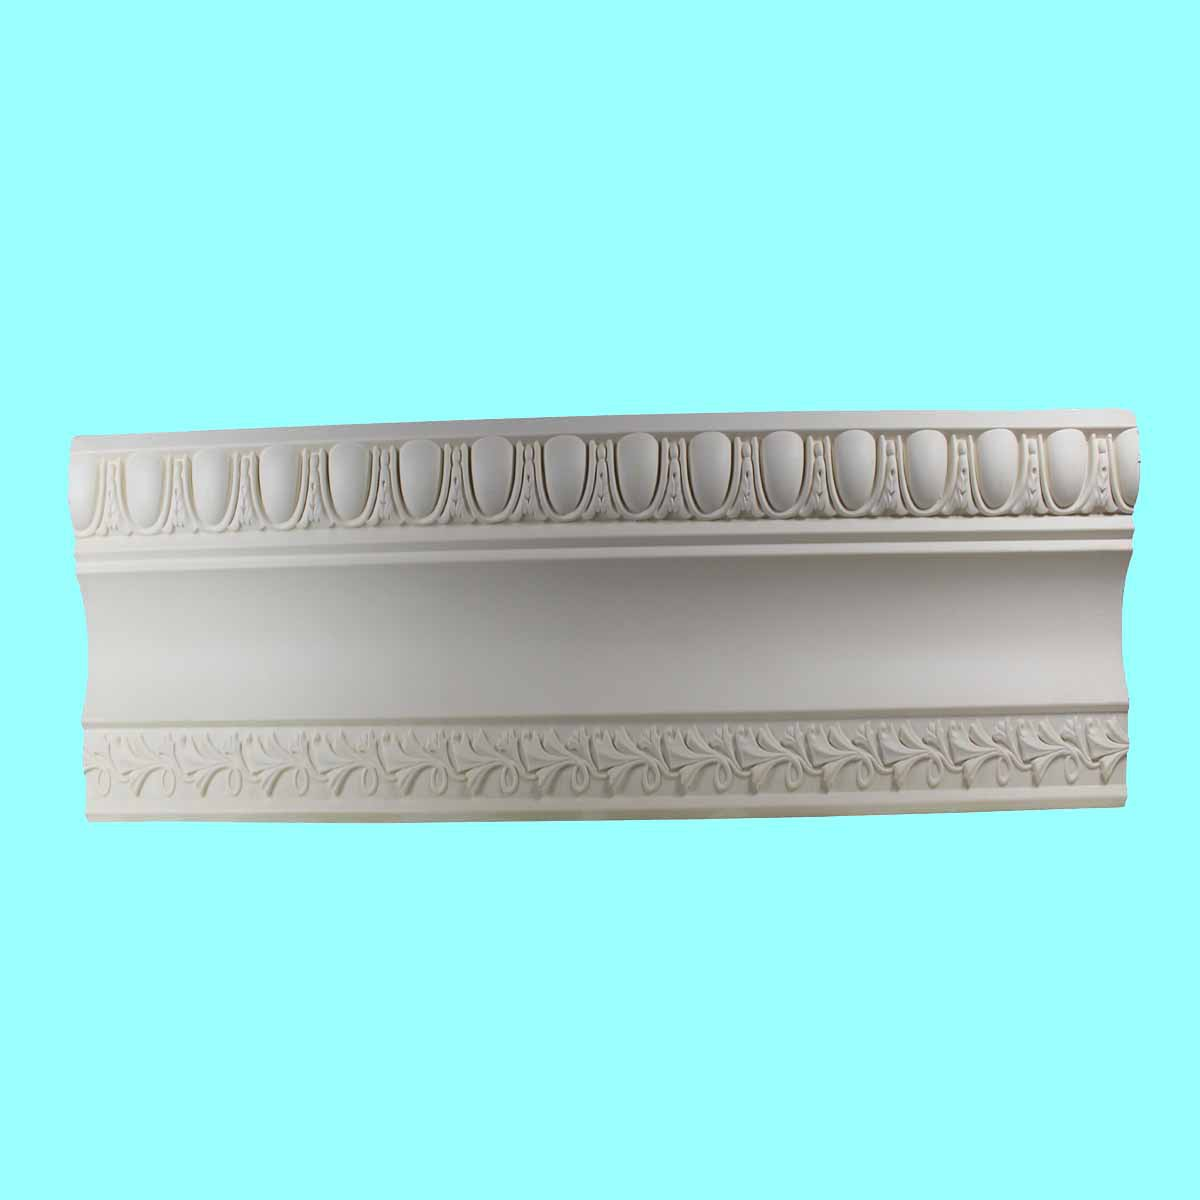 Cornice White Urethane 24 Sample of 11584 Cornice Cornice Moulding Cornice Molding